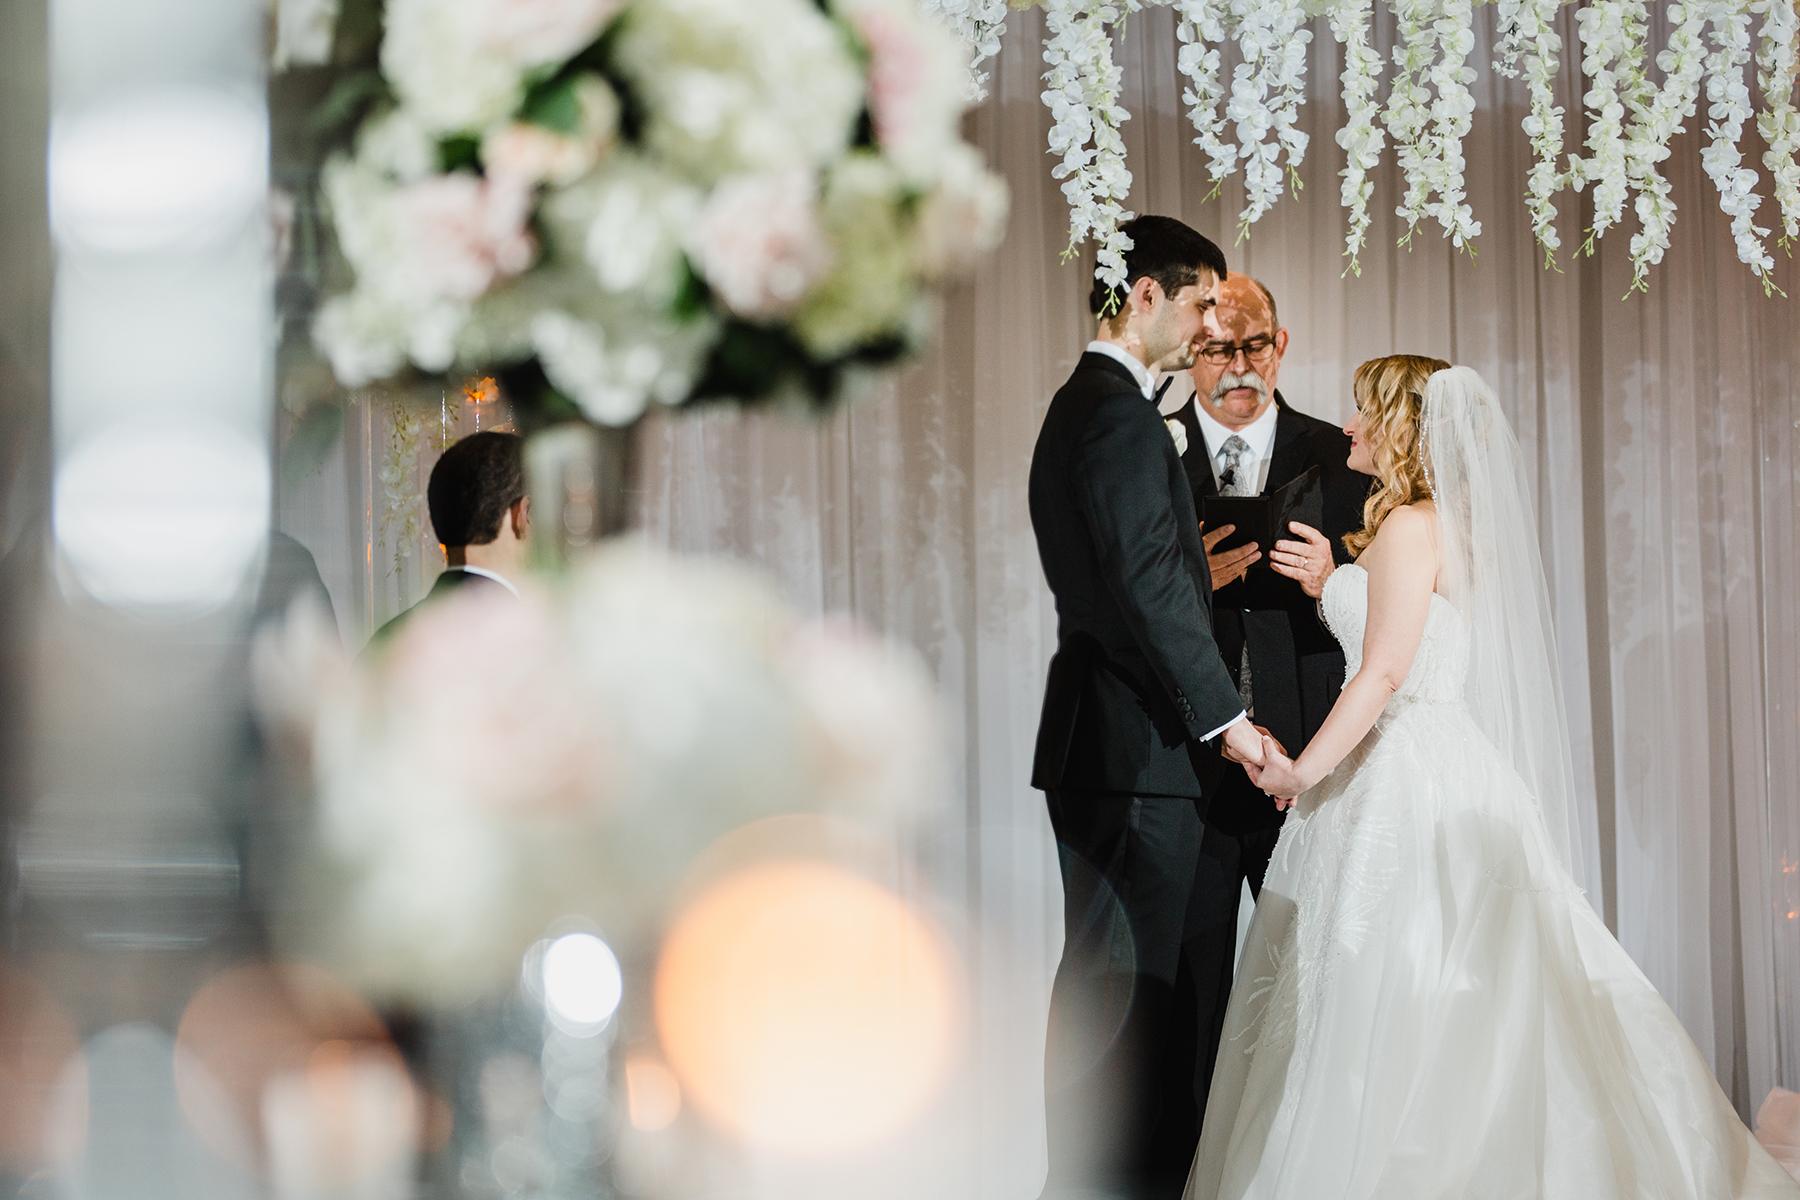 Traci_and_Ryan_Wedding-352.jpg